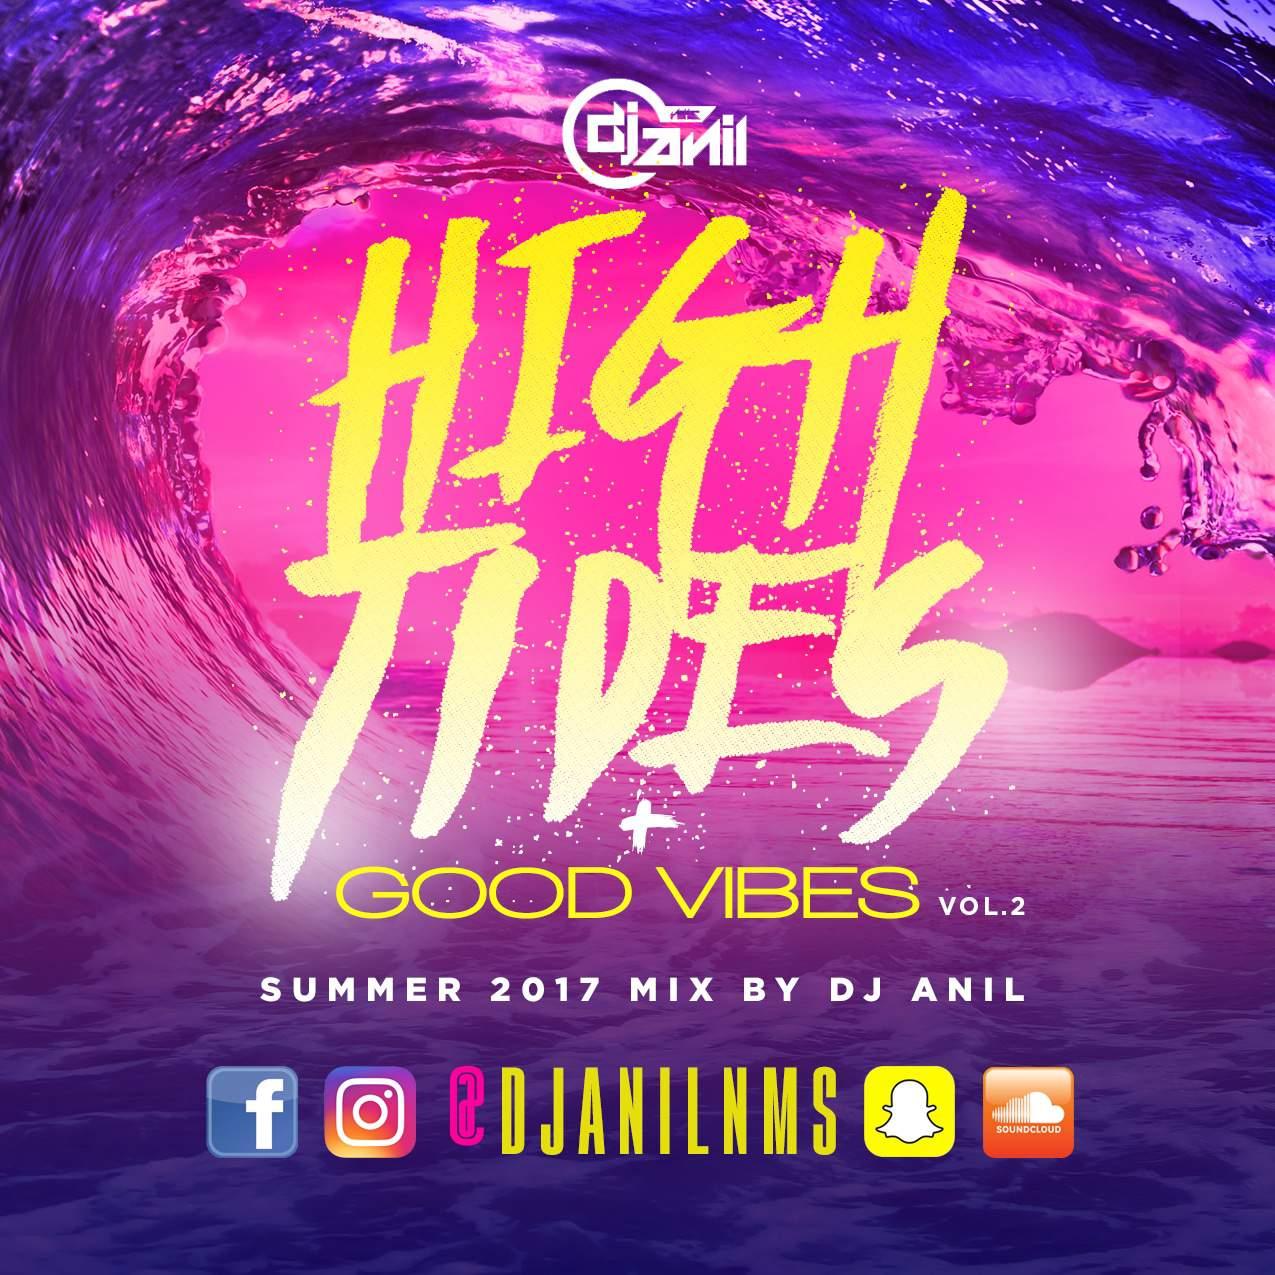 Dj Anil NMS High Tides and Good Vibes Vol 2